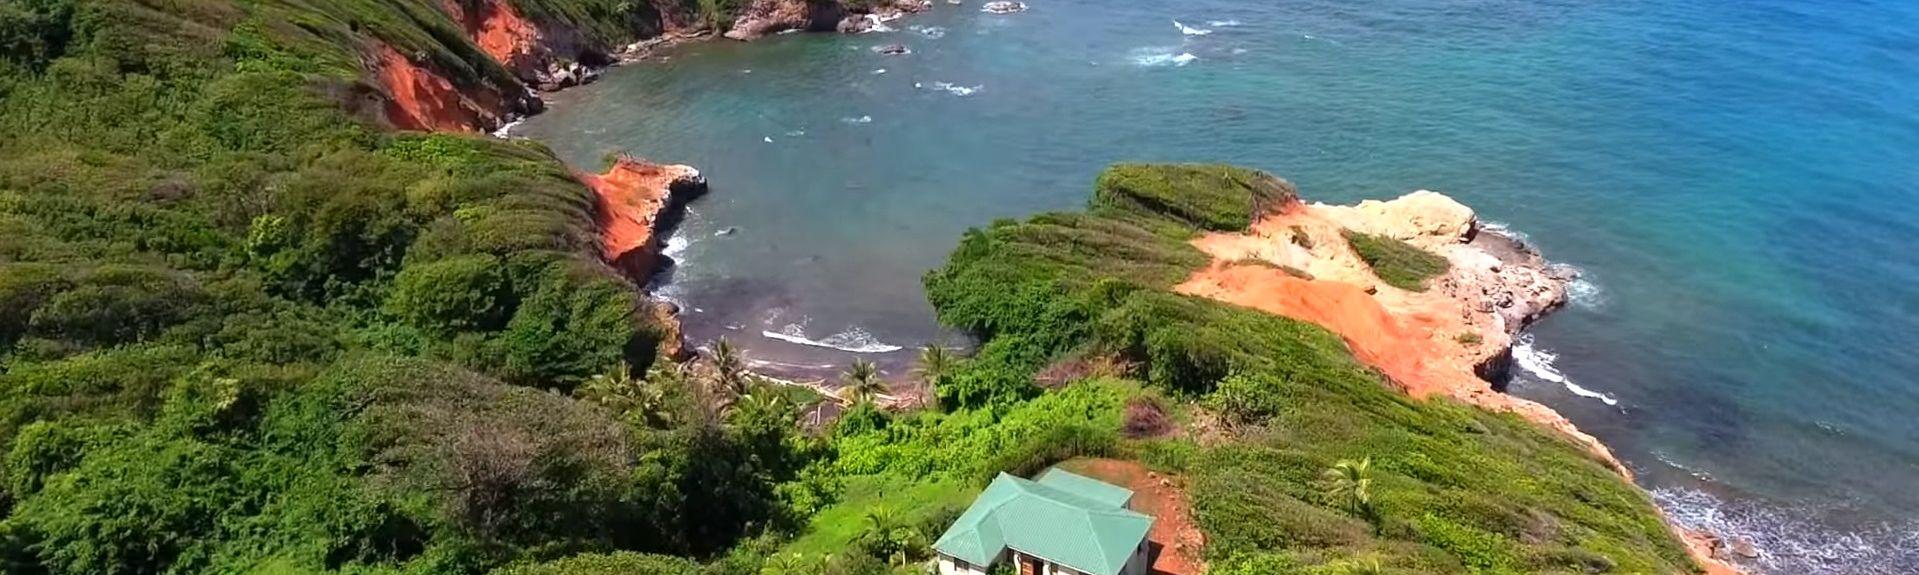 Anse Du Mé, St. Andrew, Dominica